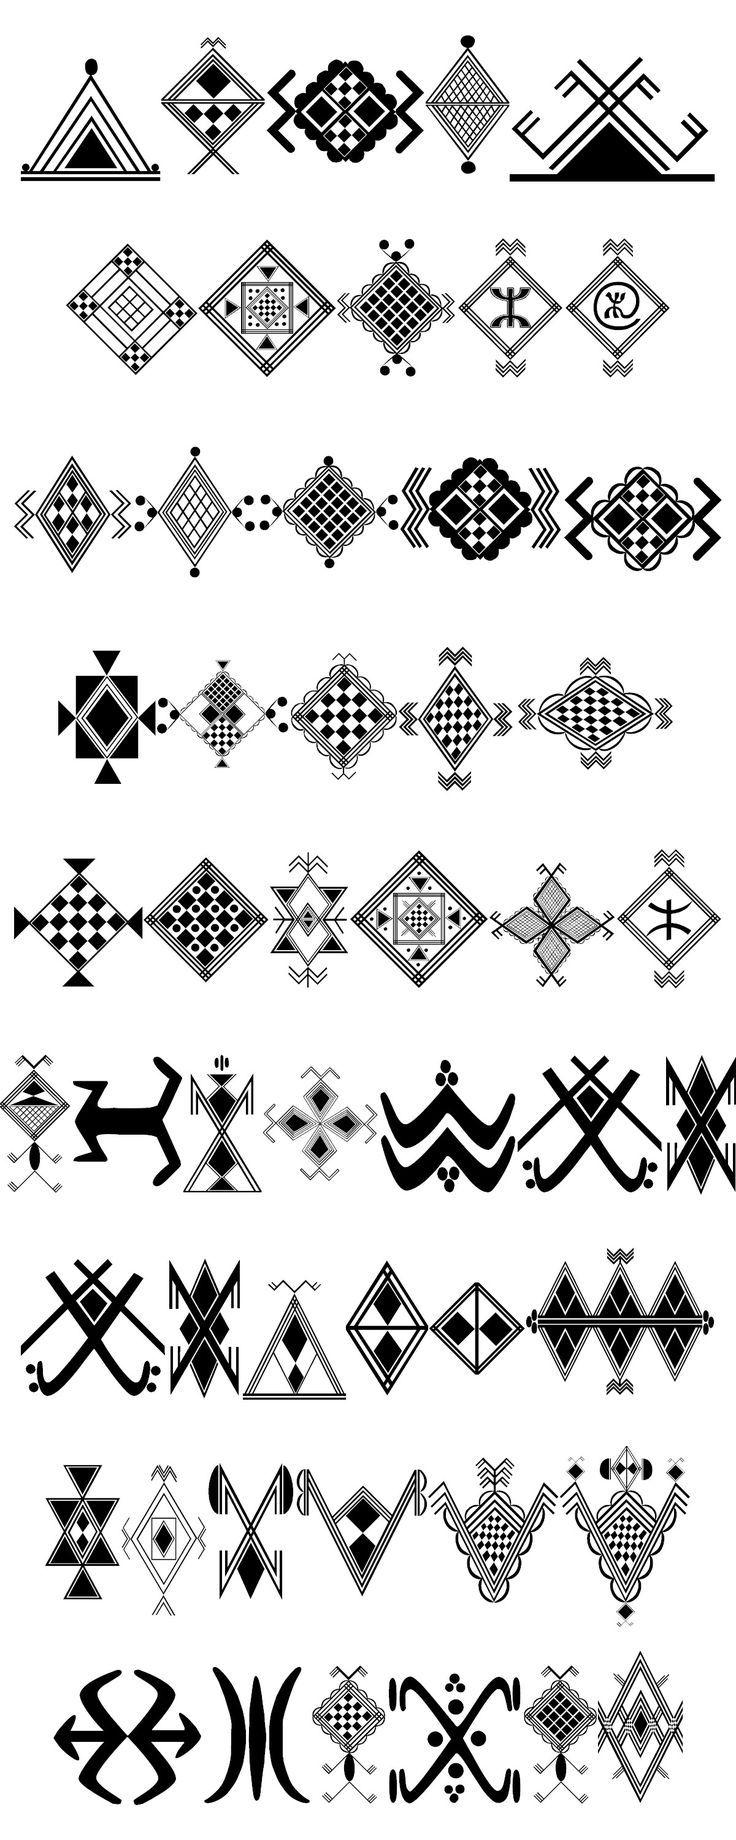 Berber symbols google search north africa ouled nail tuareg berber symbols google search biocorpaavc